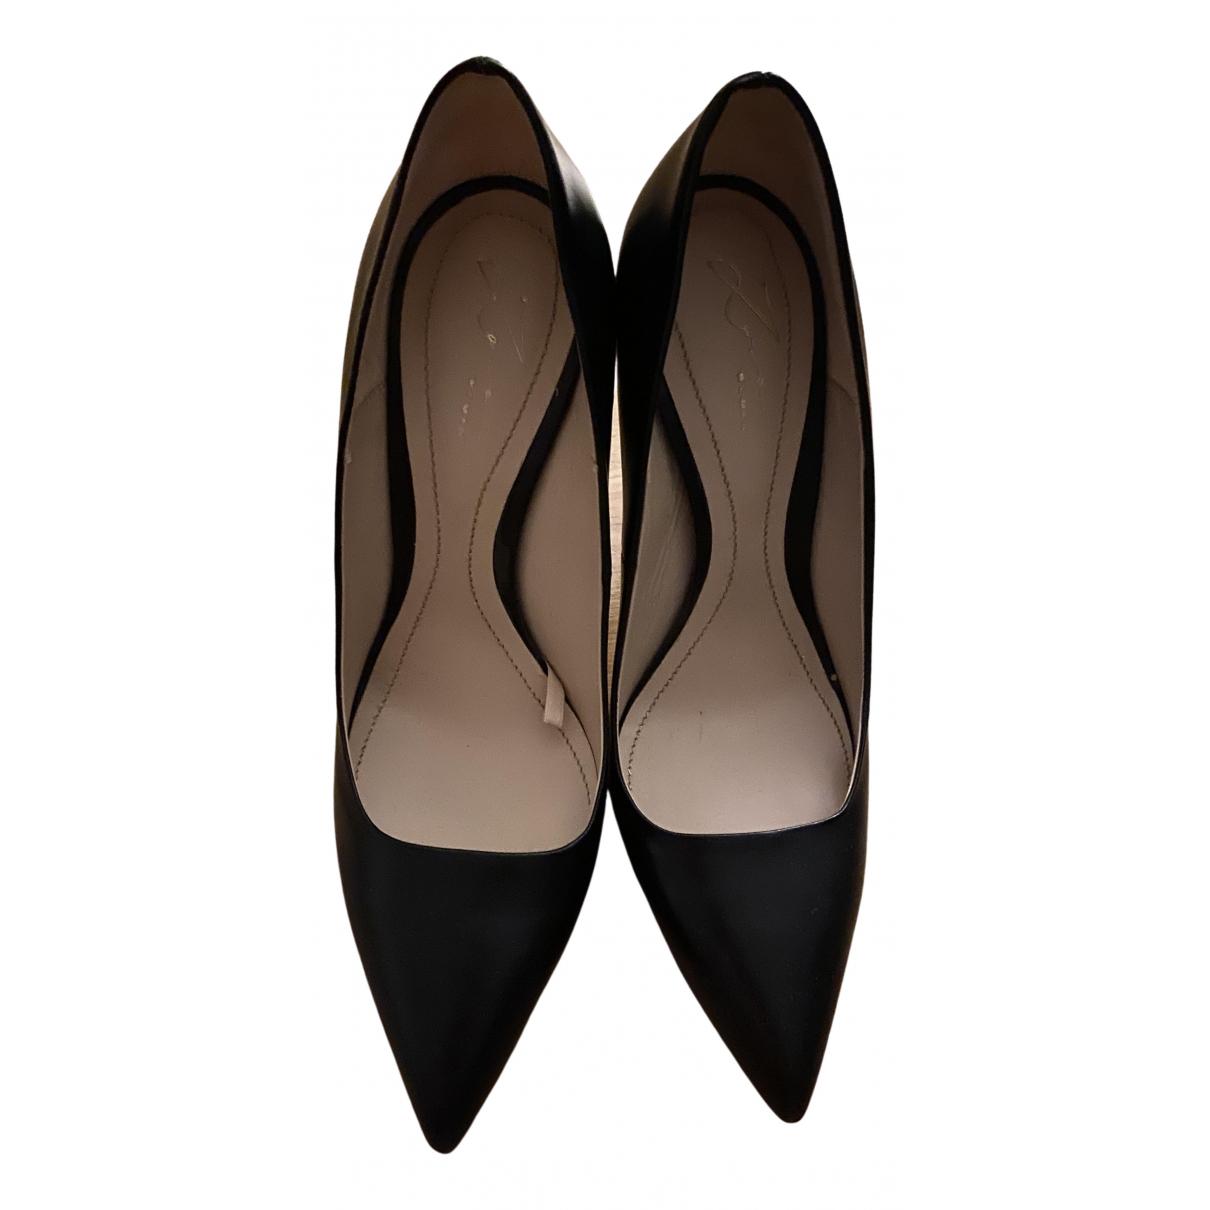 Zara \N Black Leather Heels for Women 40 EU